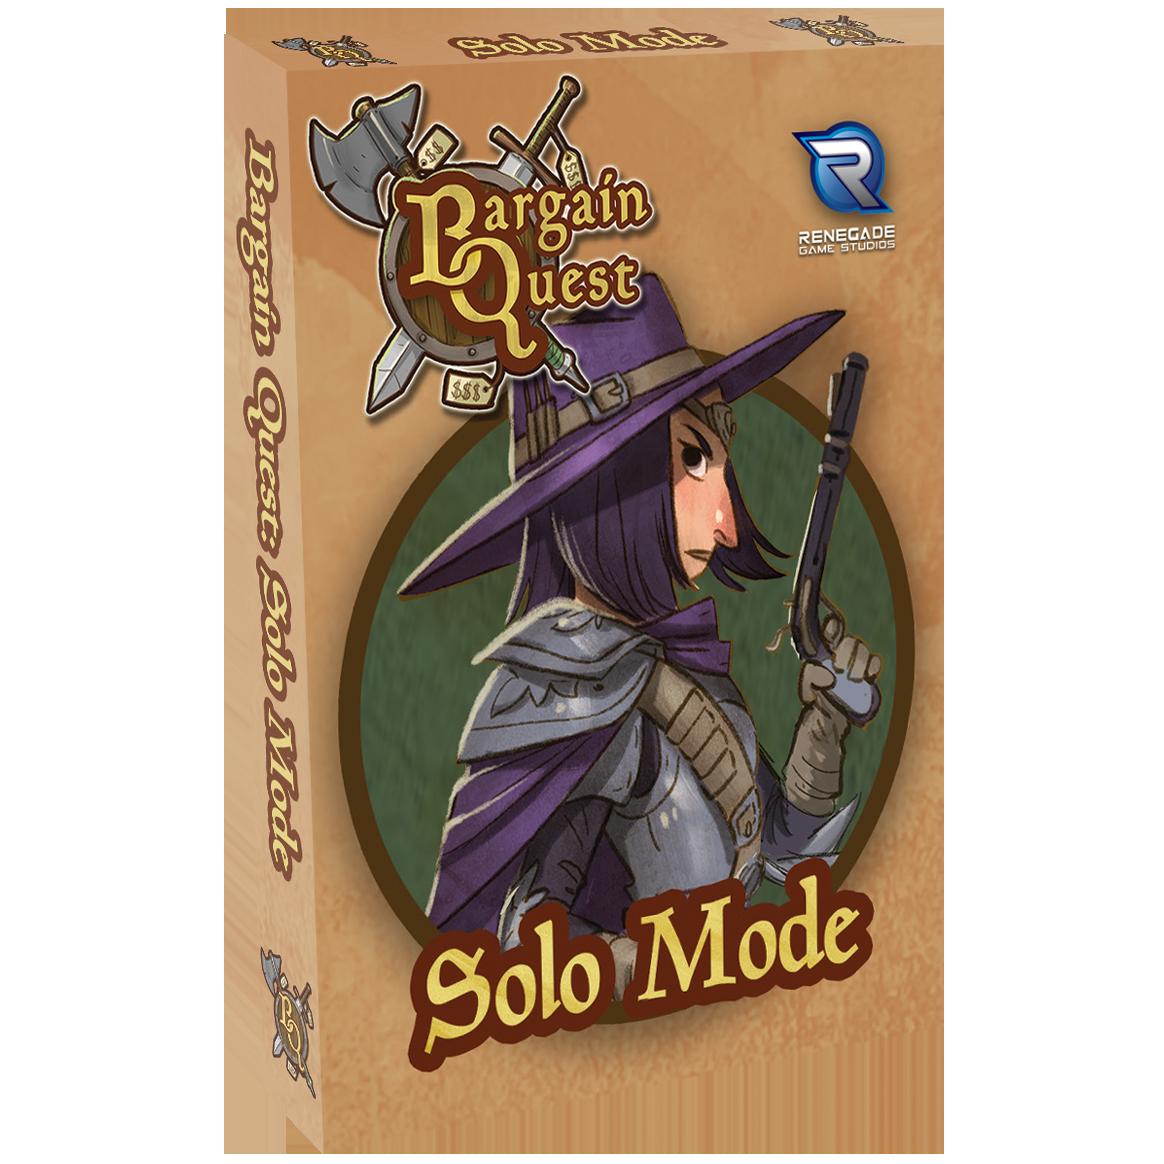 BargainQuest_SoloMode_3D box_1164pxls_RGB.png